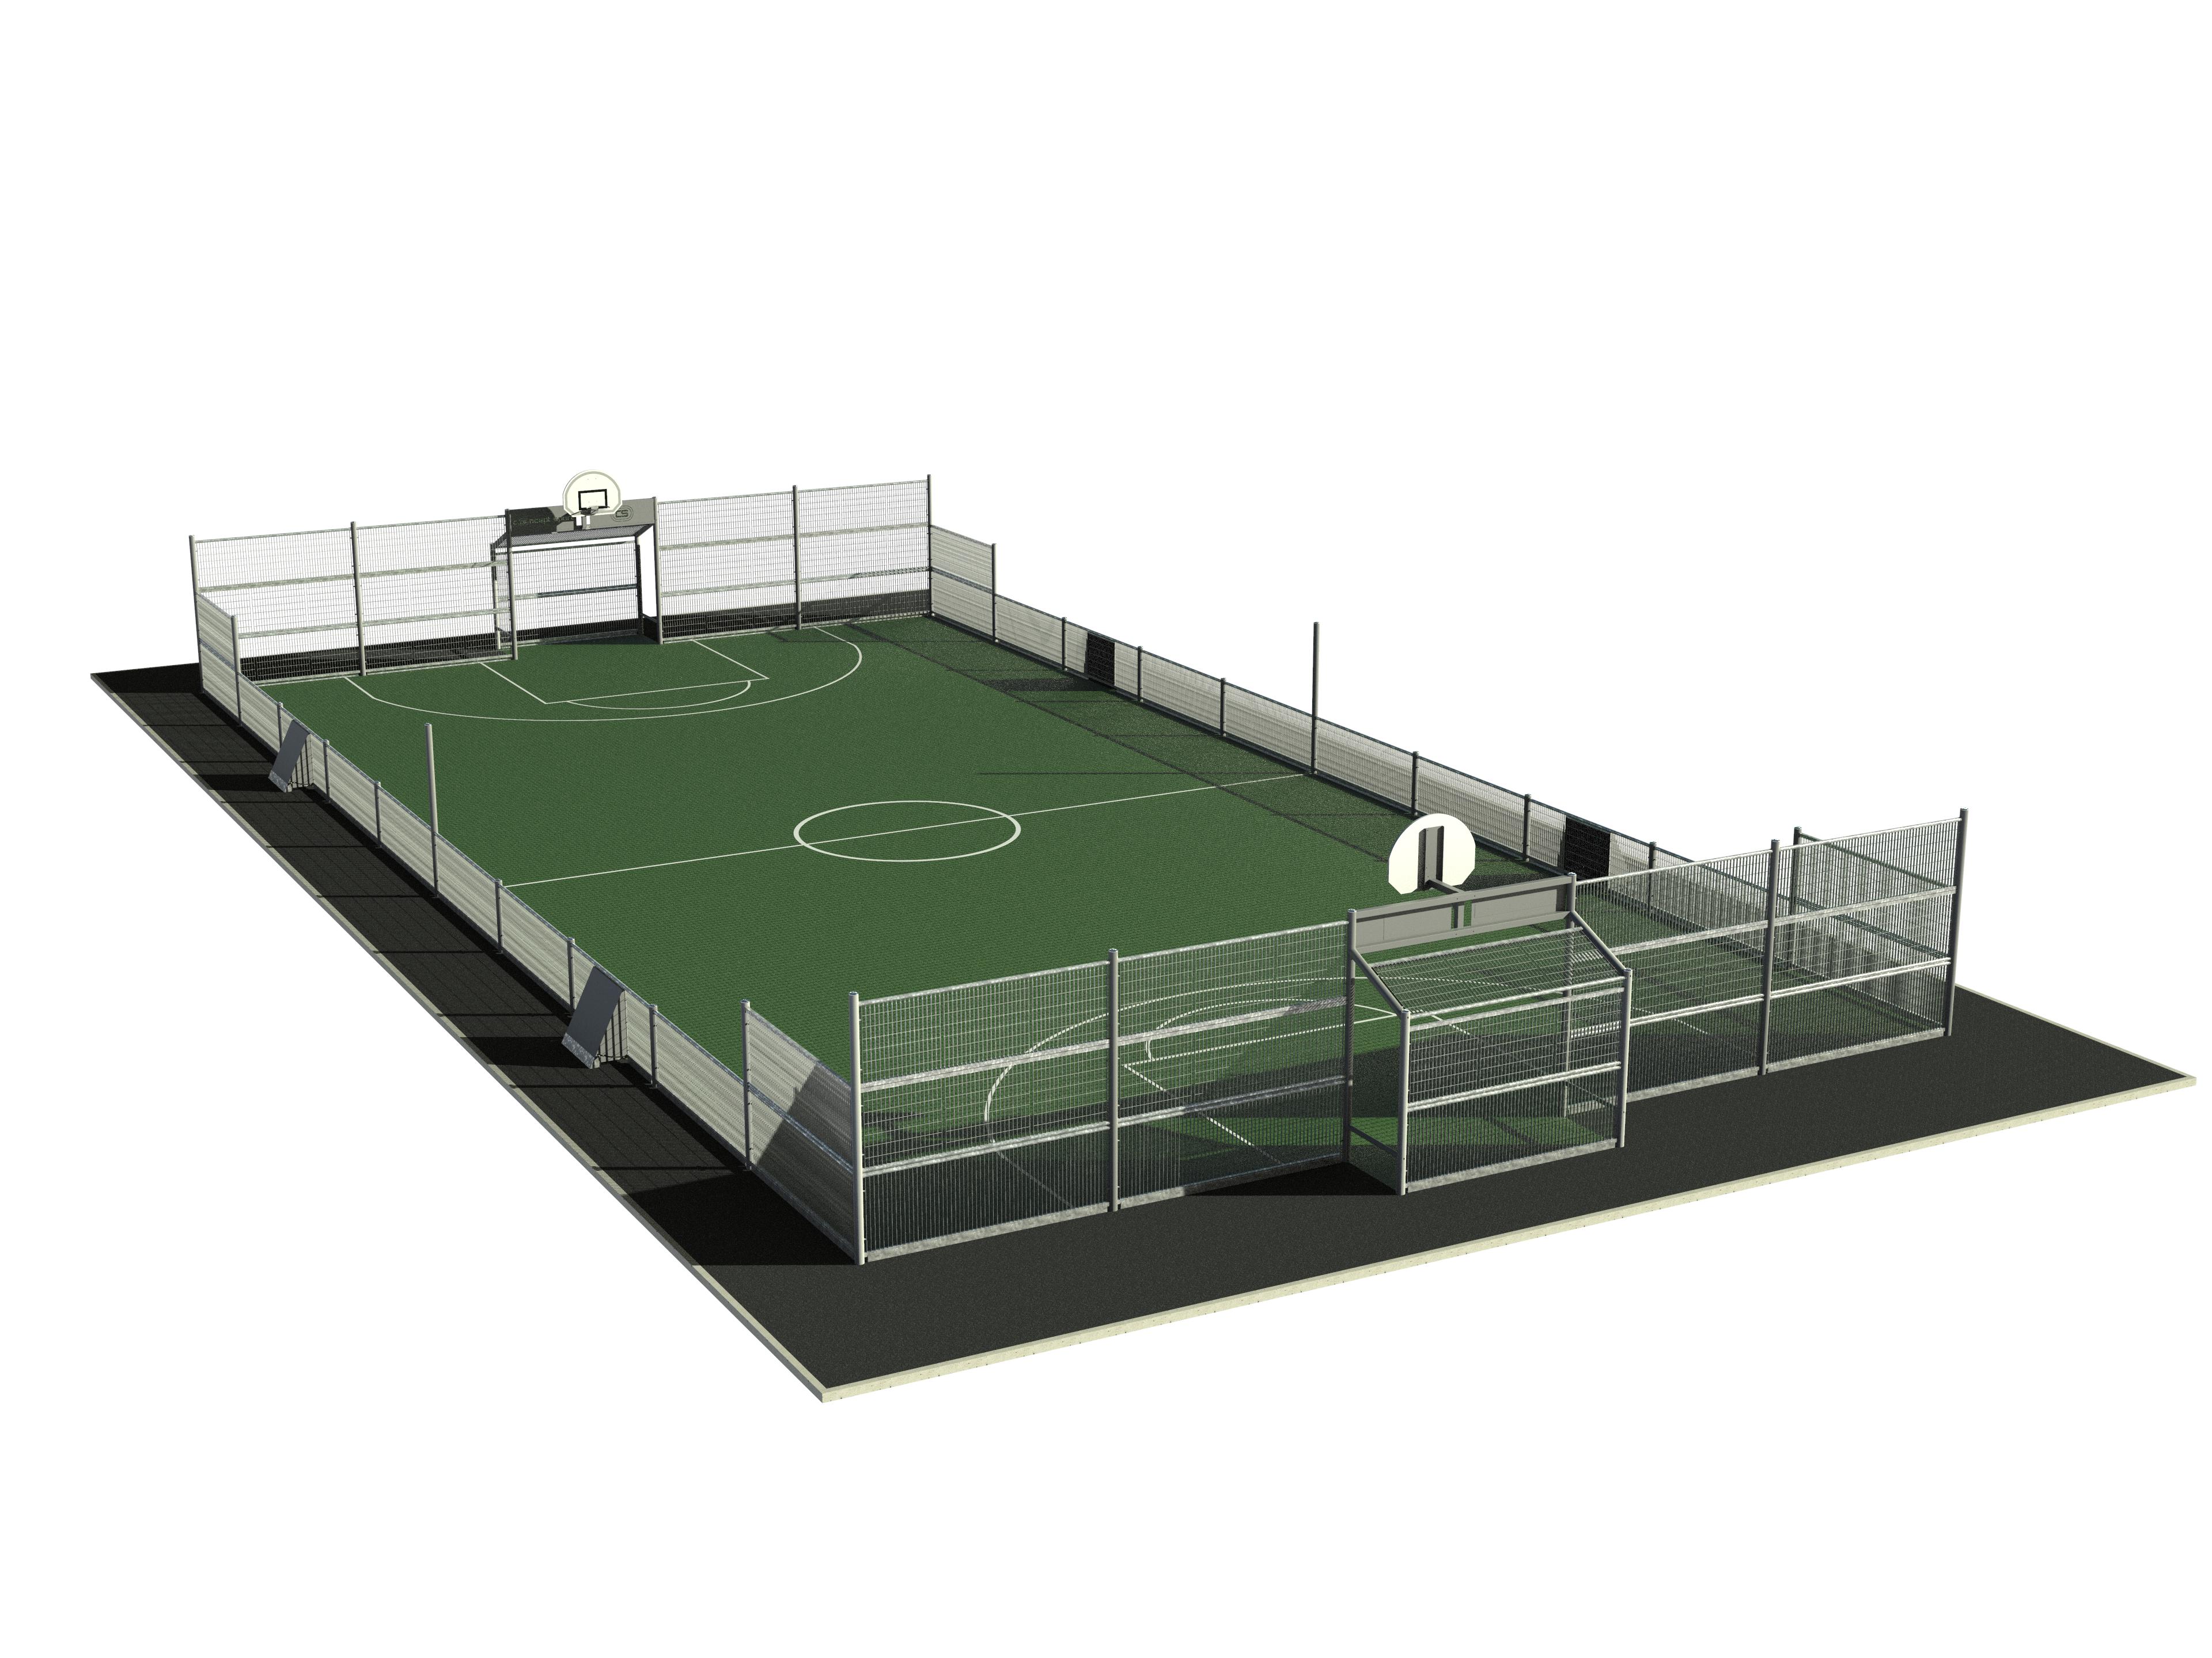 Terrain multisports spéciale 30.4 m x 15.8 m